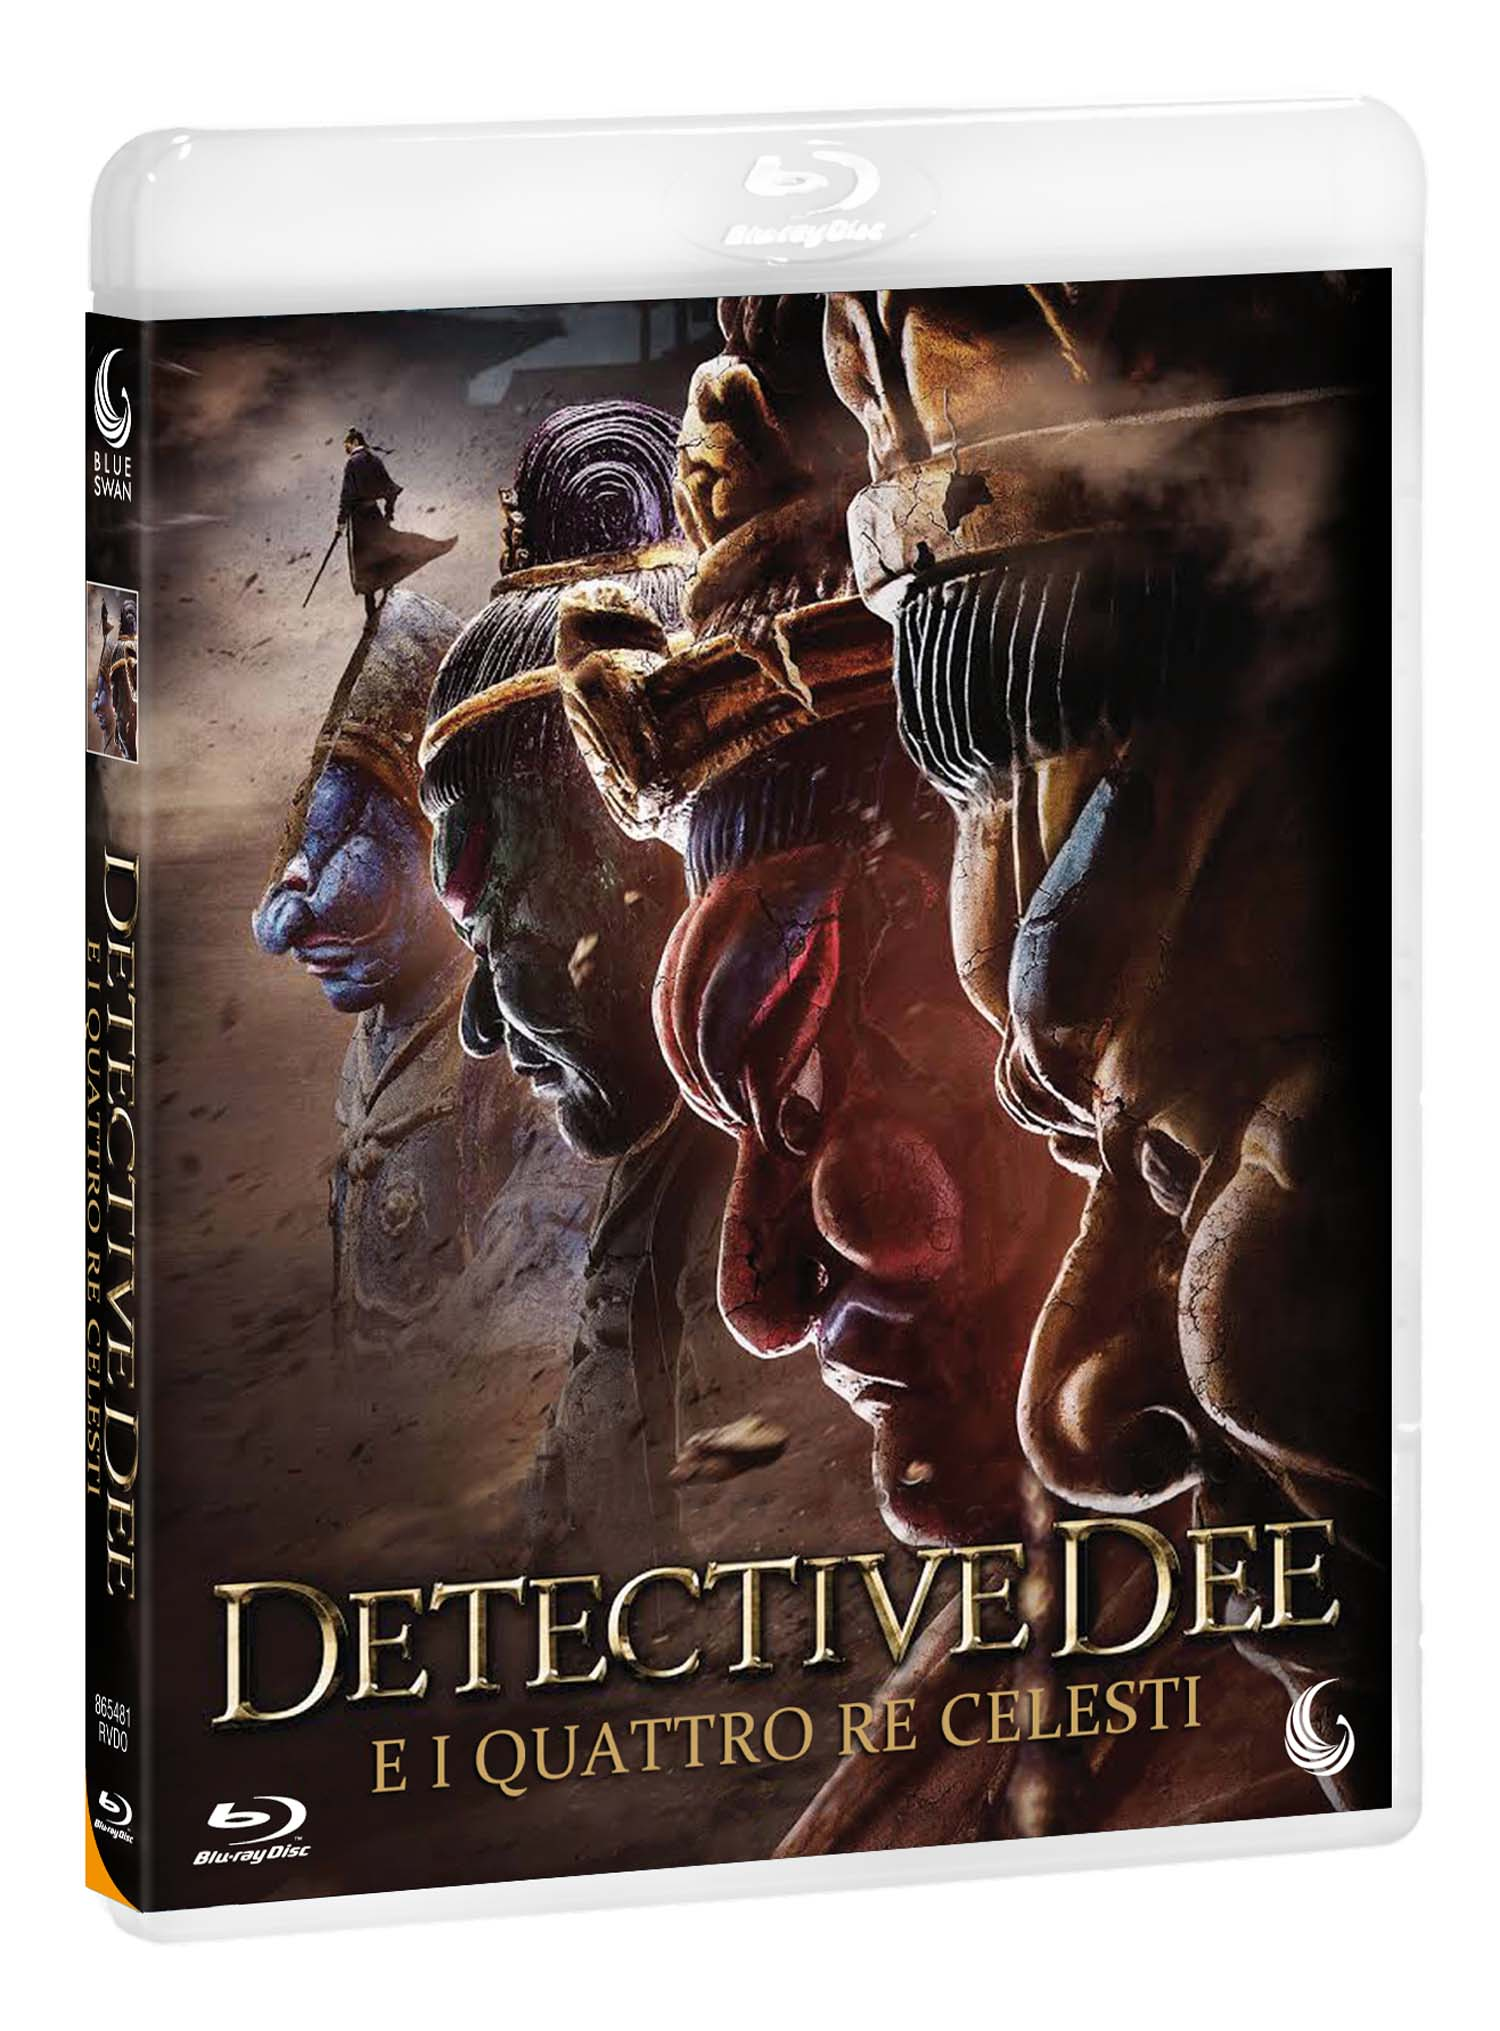 DETECTIVE DEE E I 4 RE CELESTI - BLU RAY